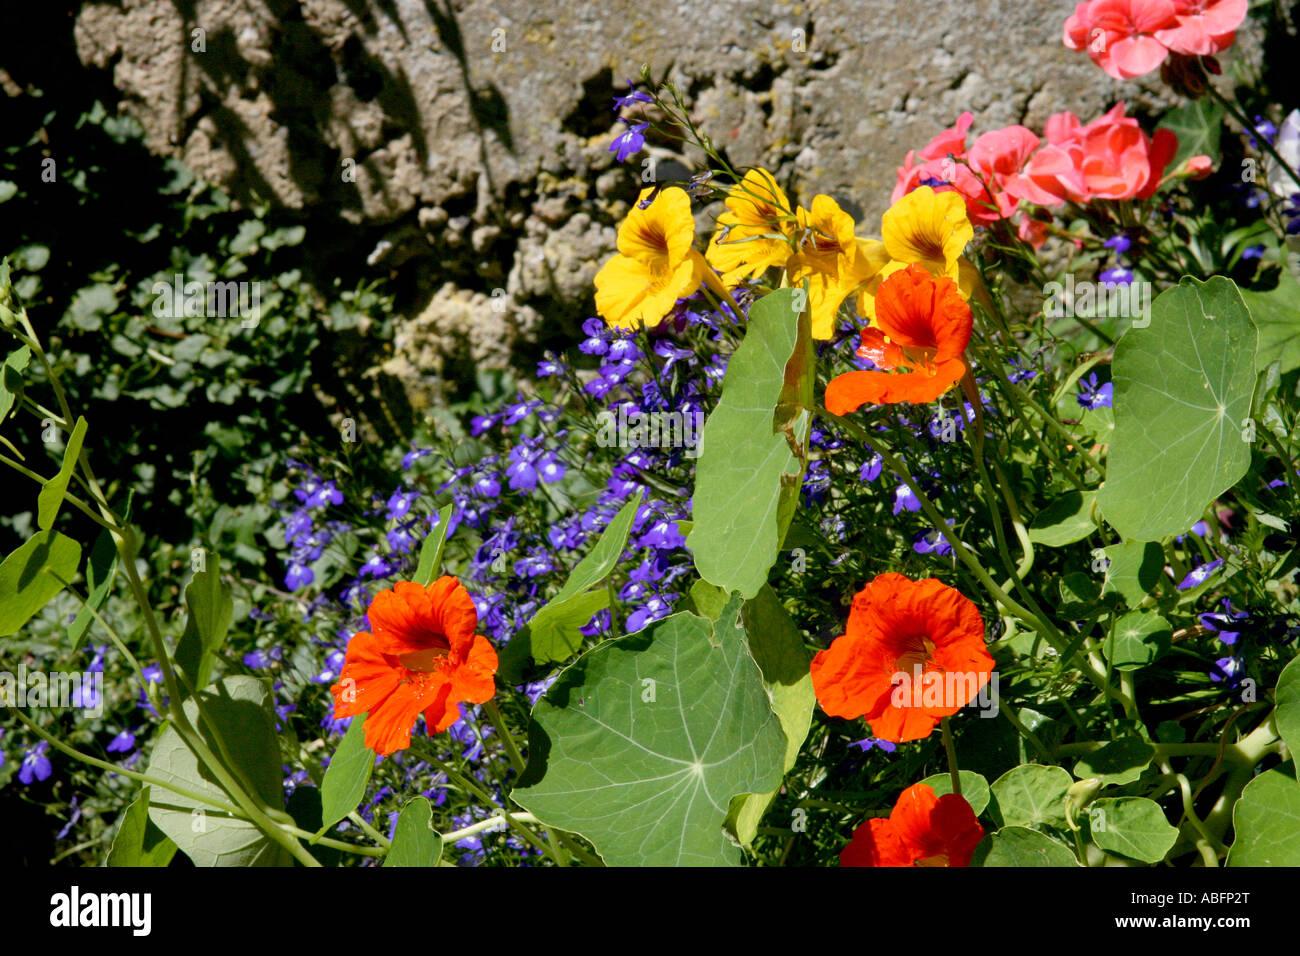 Summer Flowers In The Sun Lobelia Lobelia Erinus Nasturtium Stock